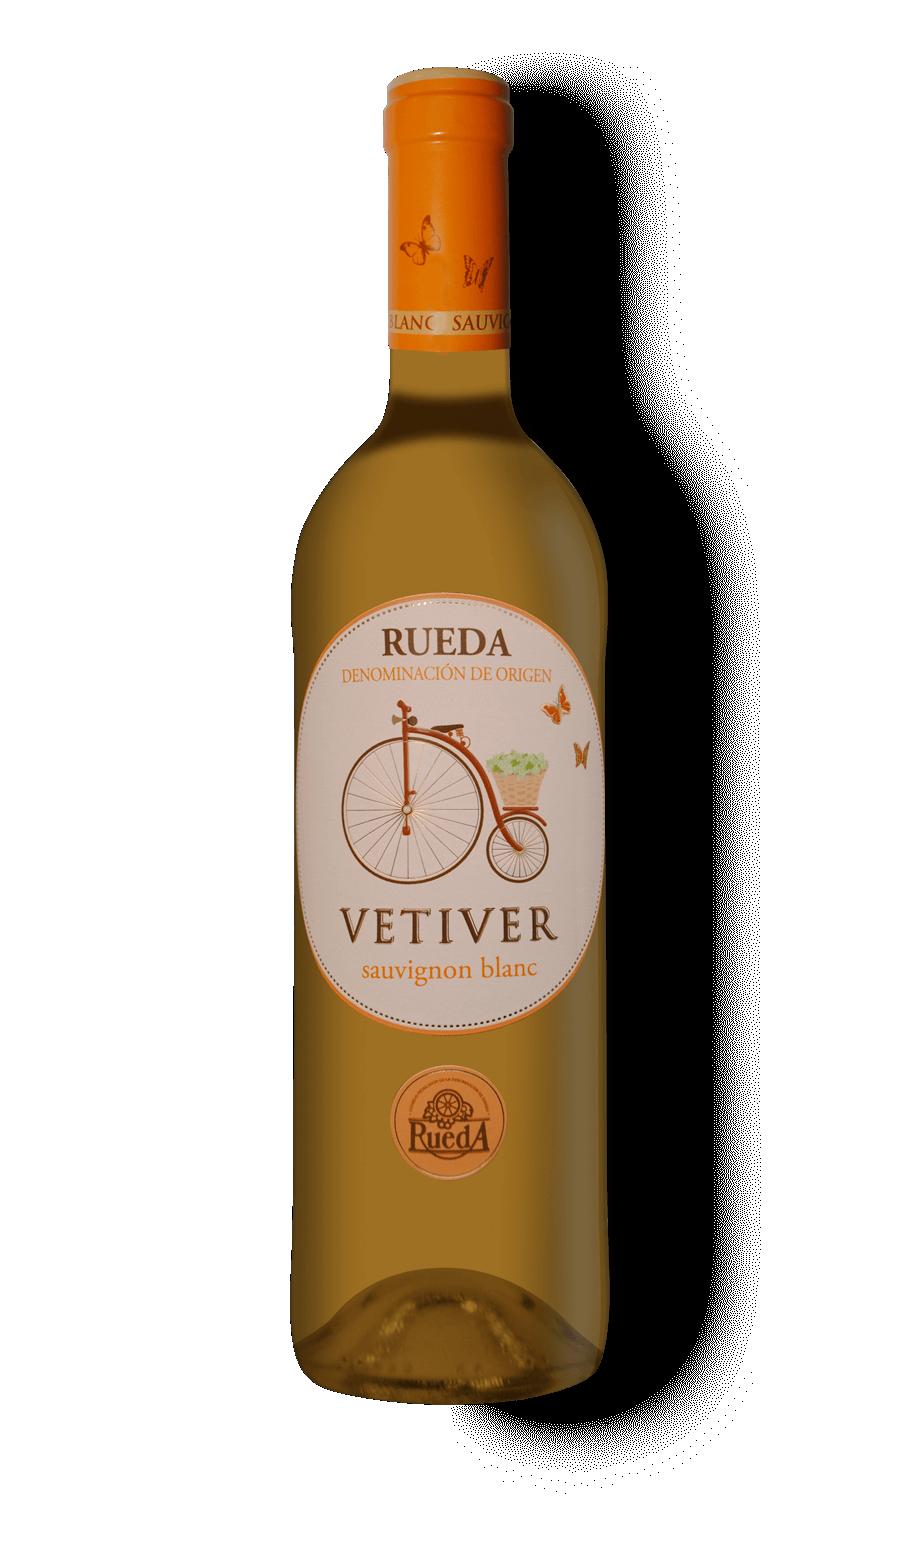 Vetiver Sauvignon blanc Rueda